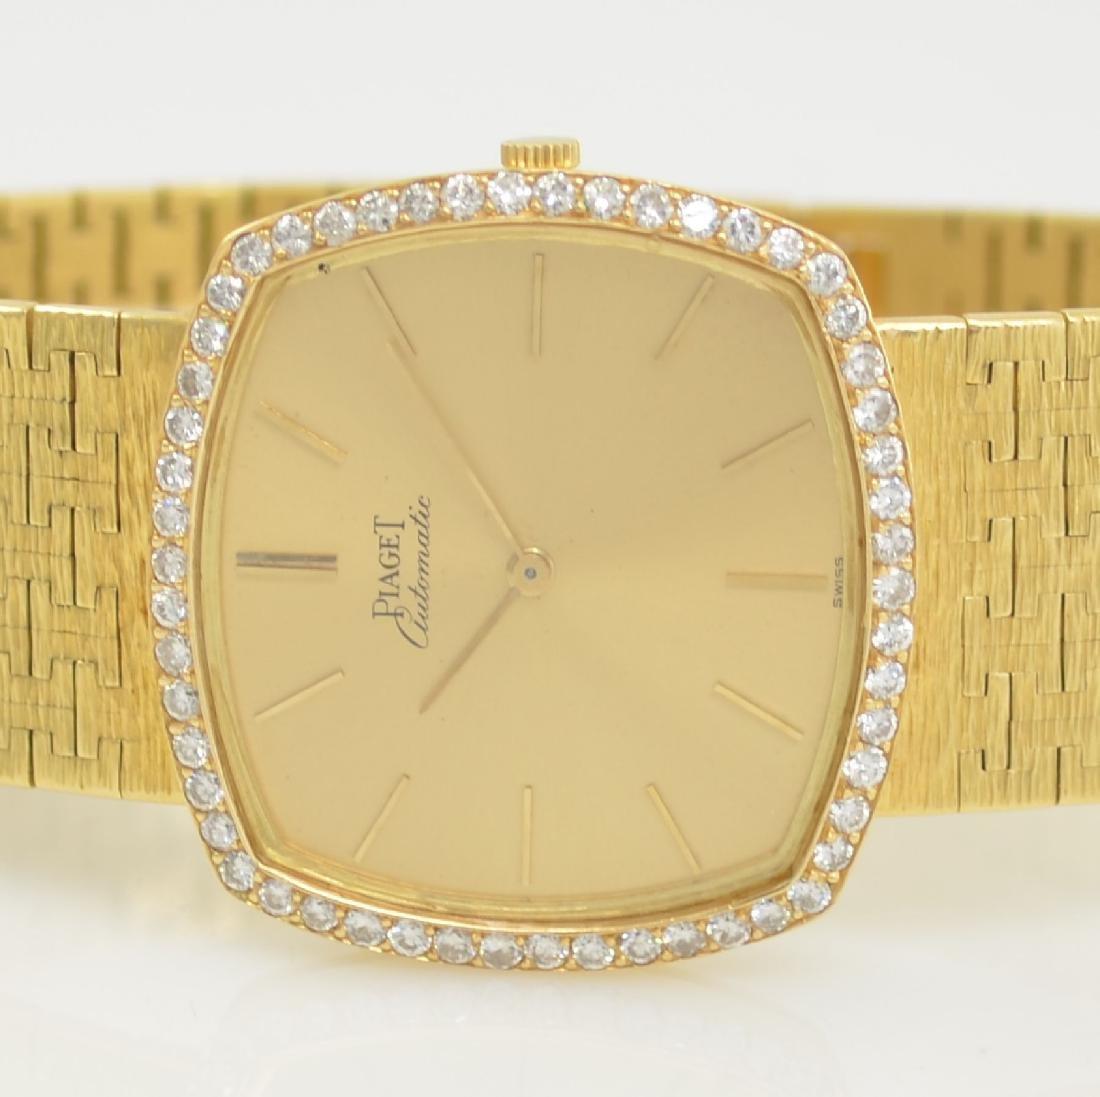 PIAGET 18k yellow gold diamond set gents wristwatch - 2